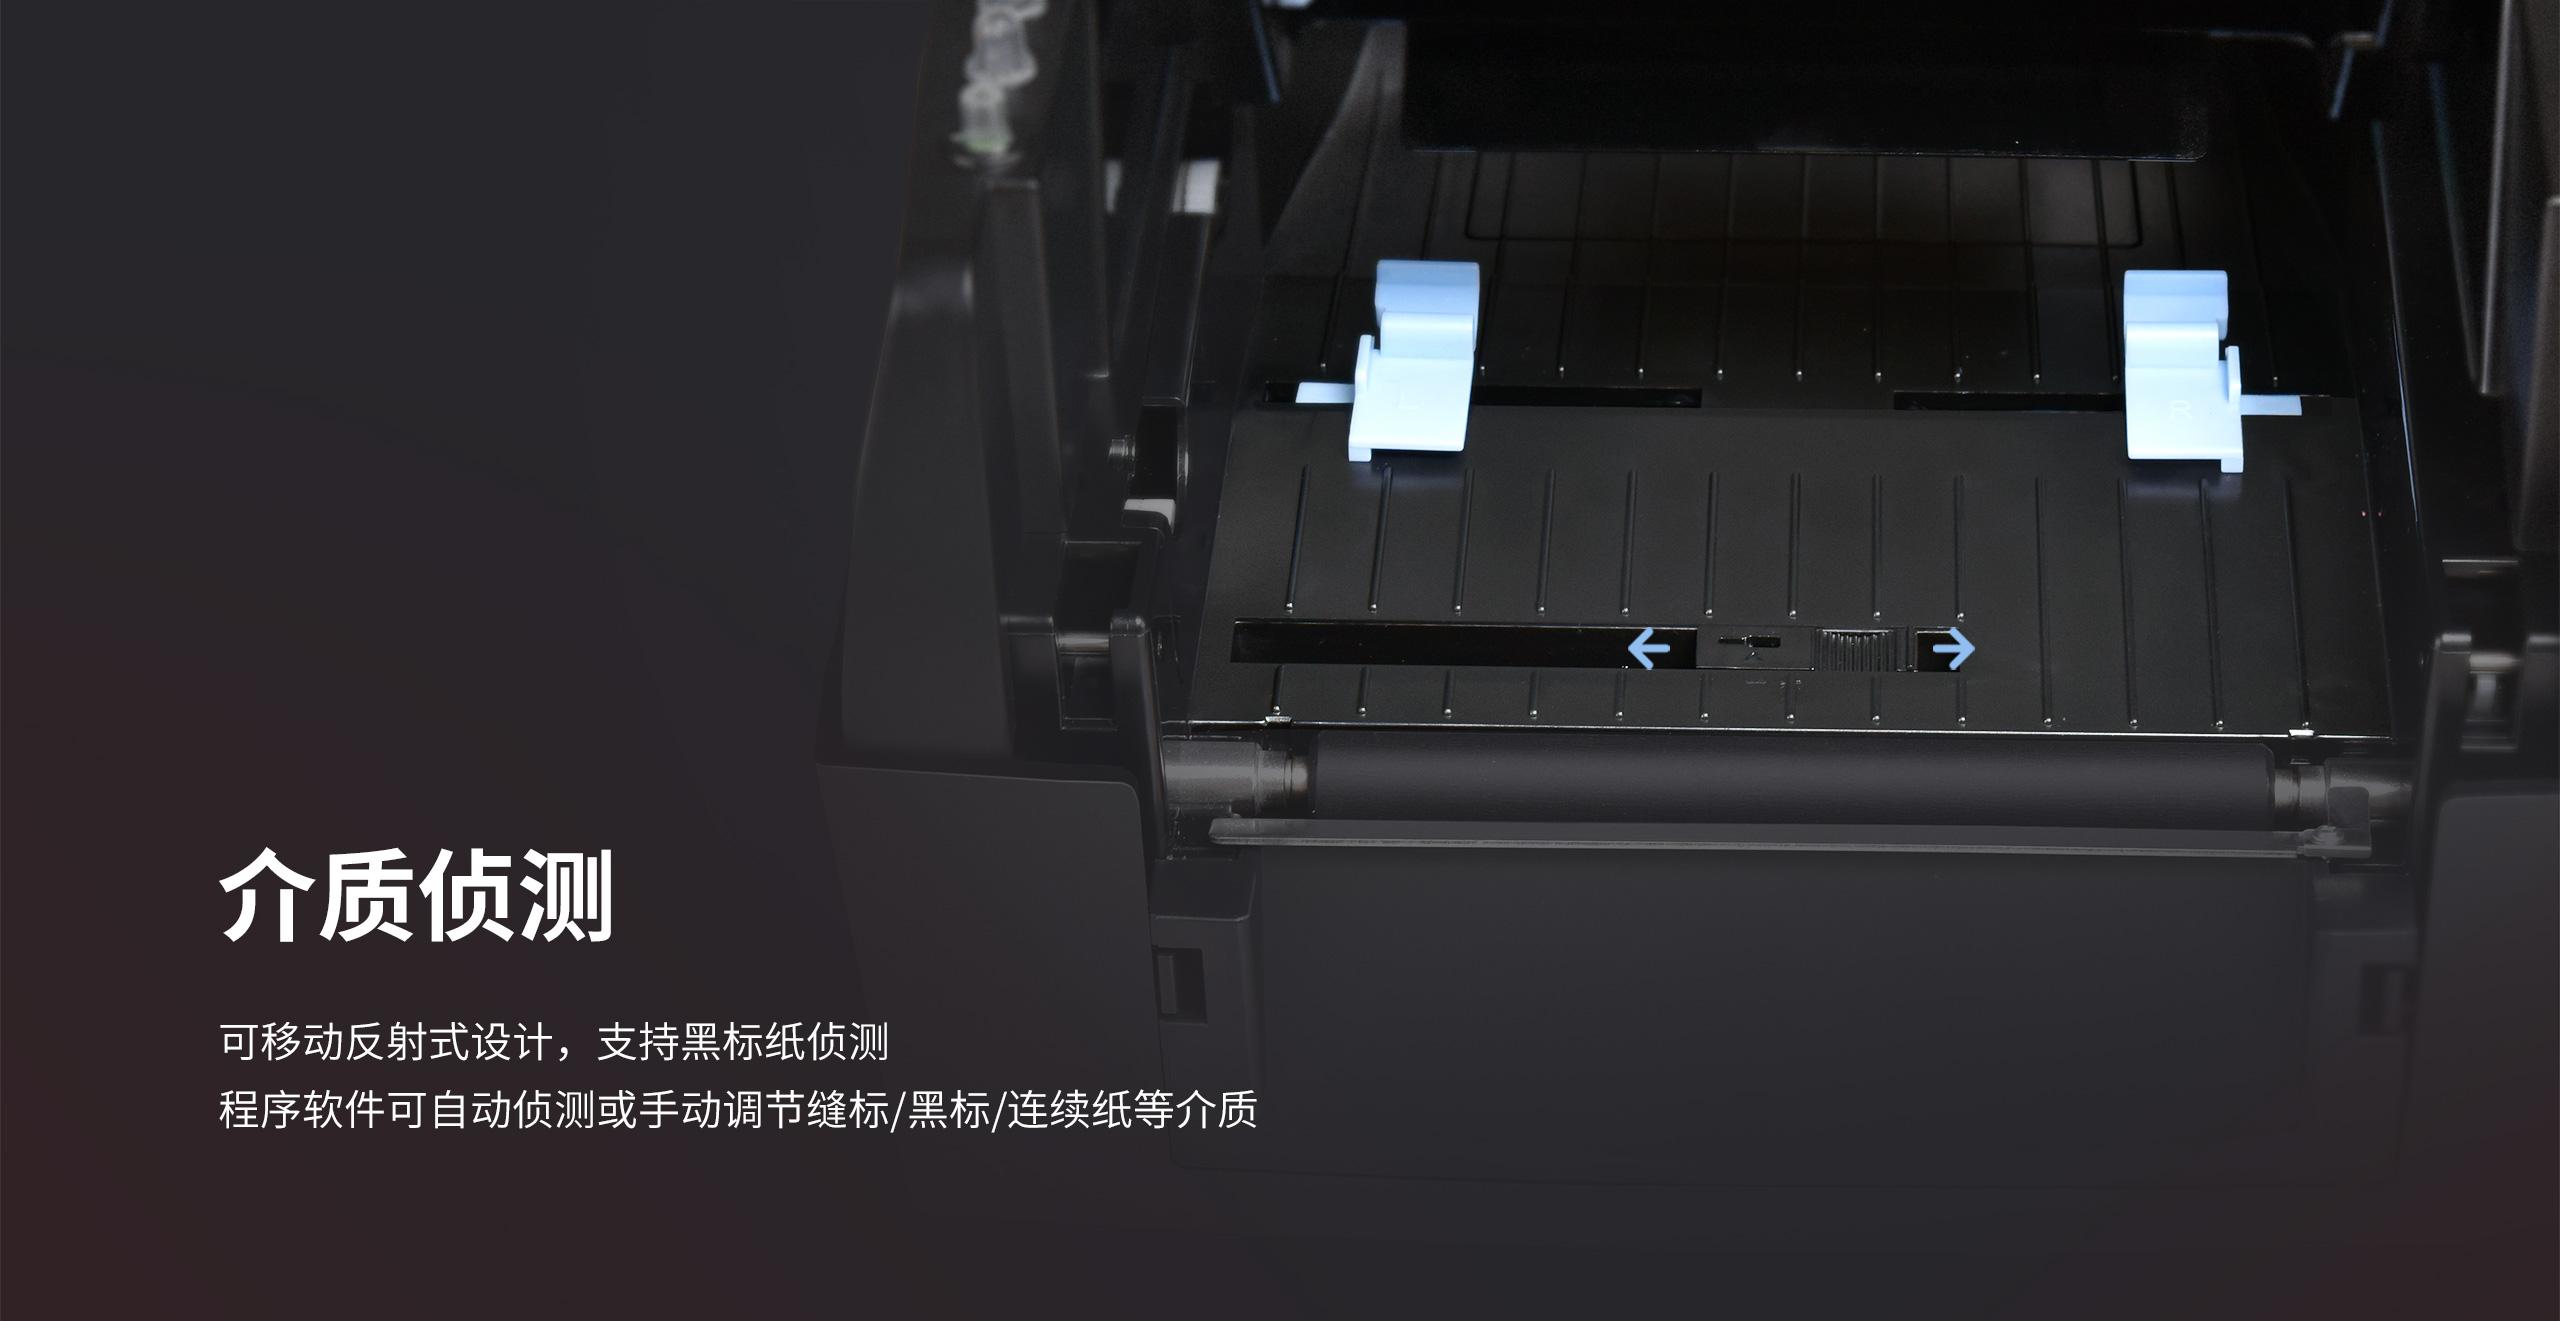 HT300/HT330条码打印机  第5张